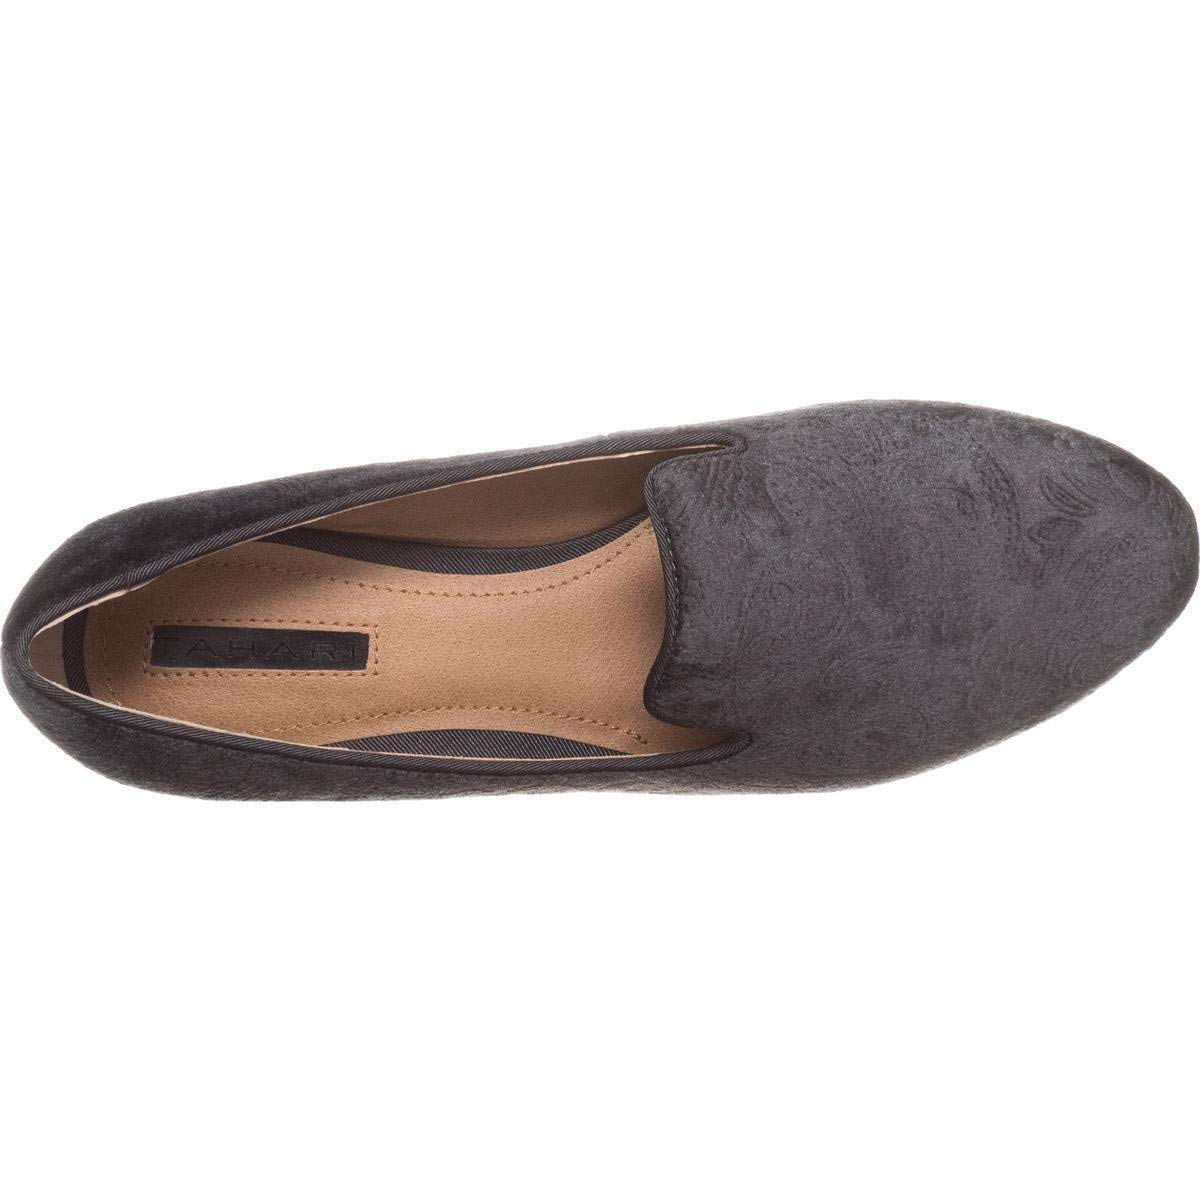 106e51bdce8 Tahari Womens Foley Almond Toe Loafers